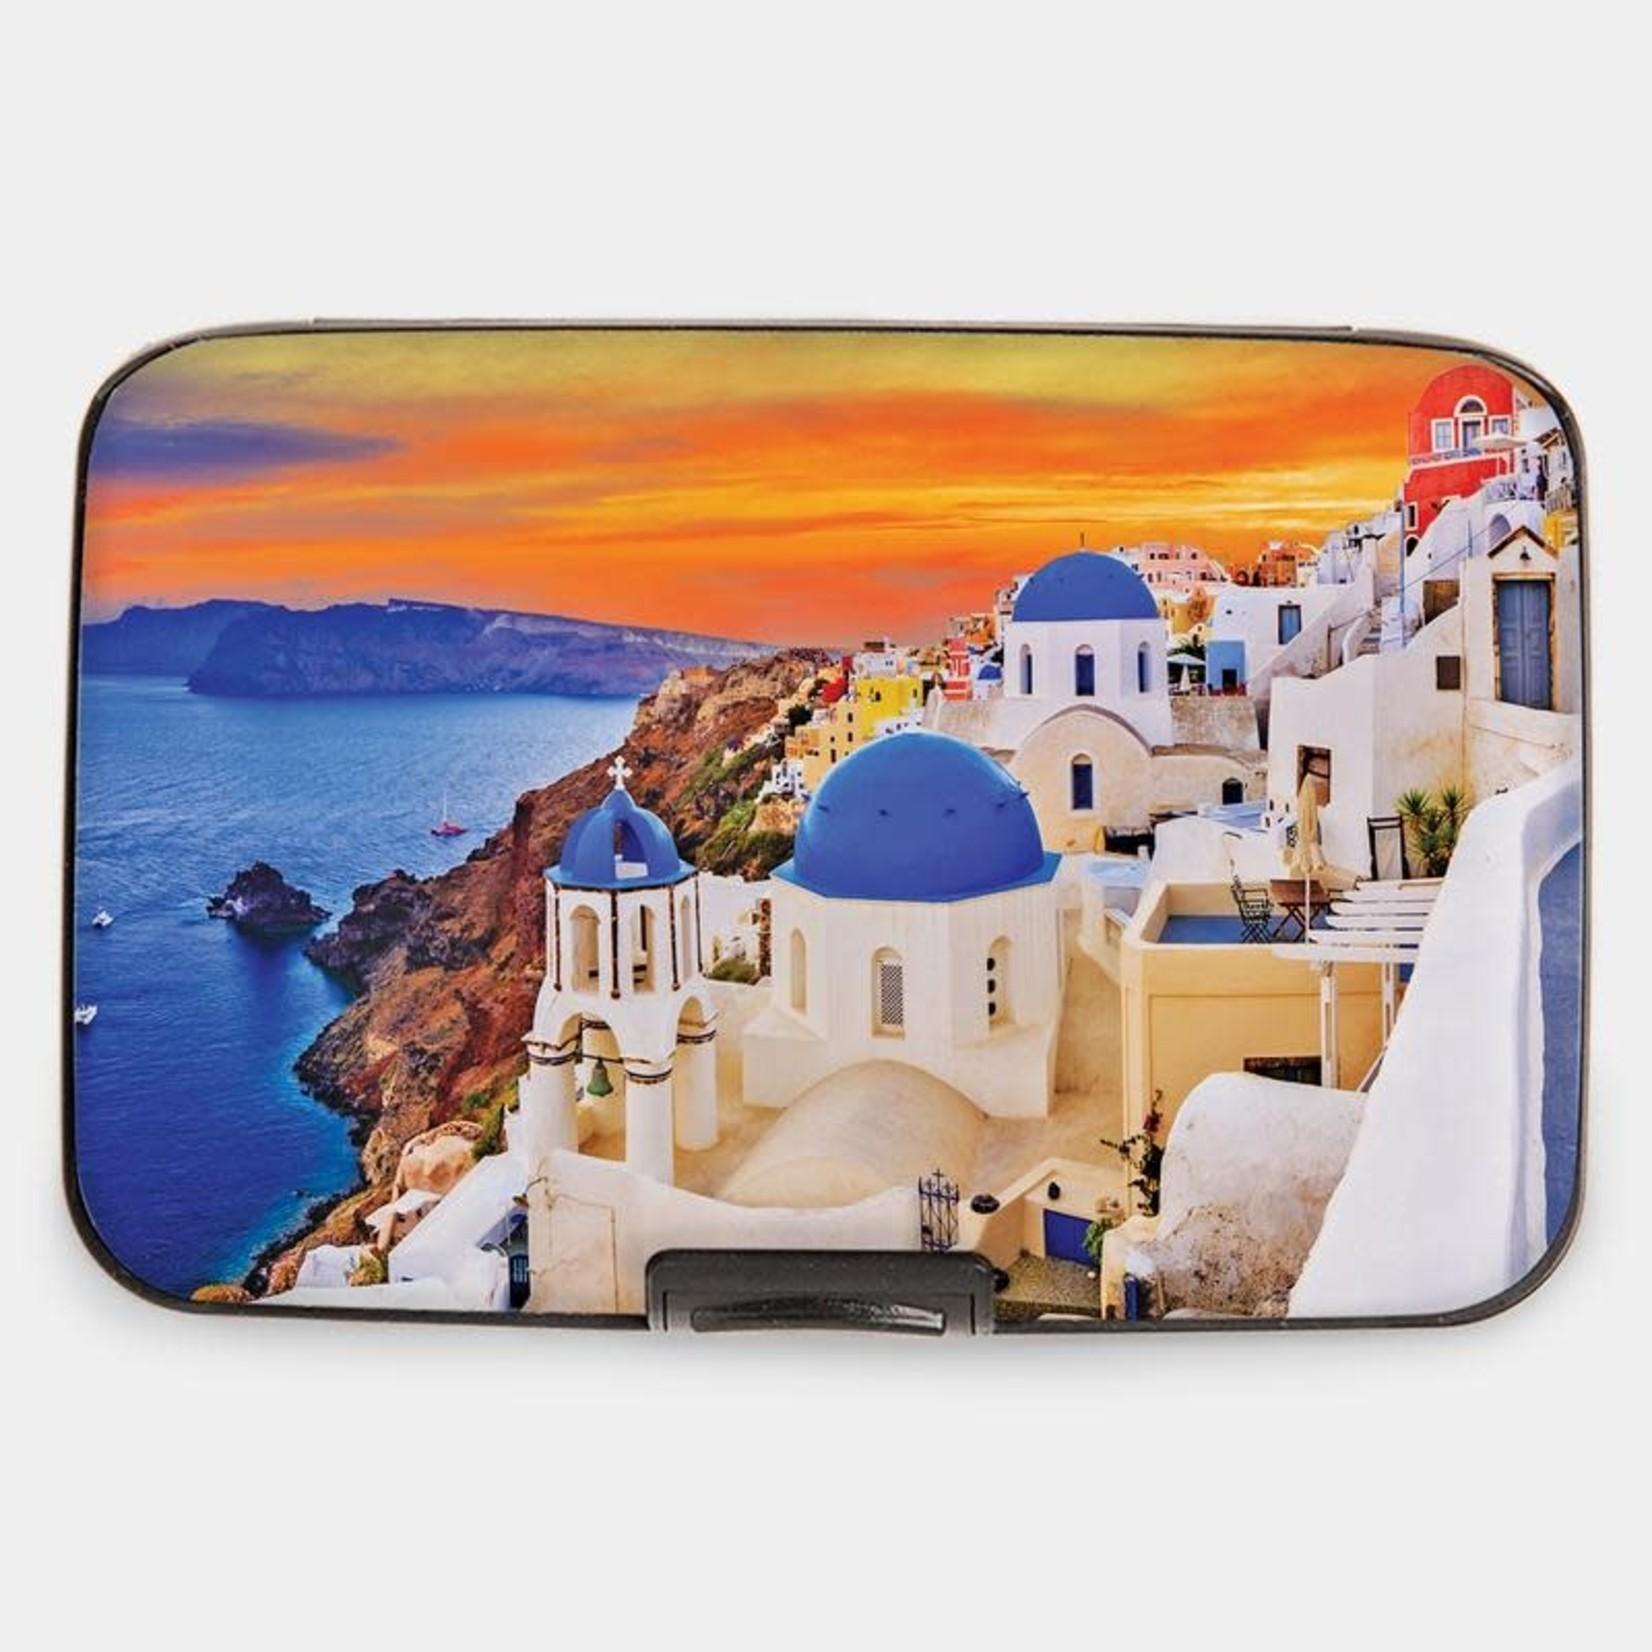 Monarque Armored Wallet - Travel Santorini